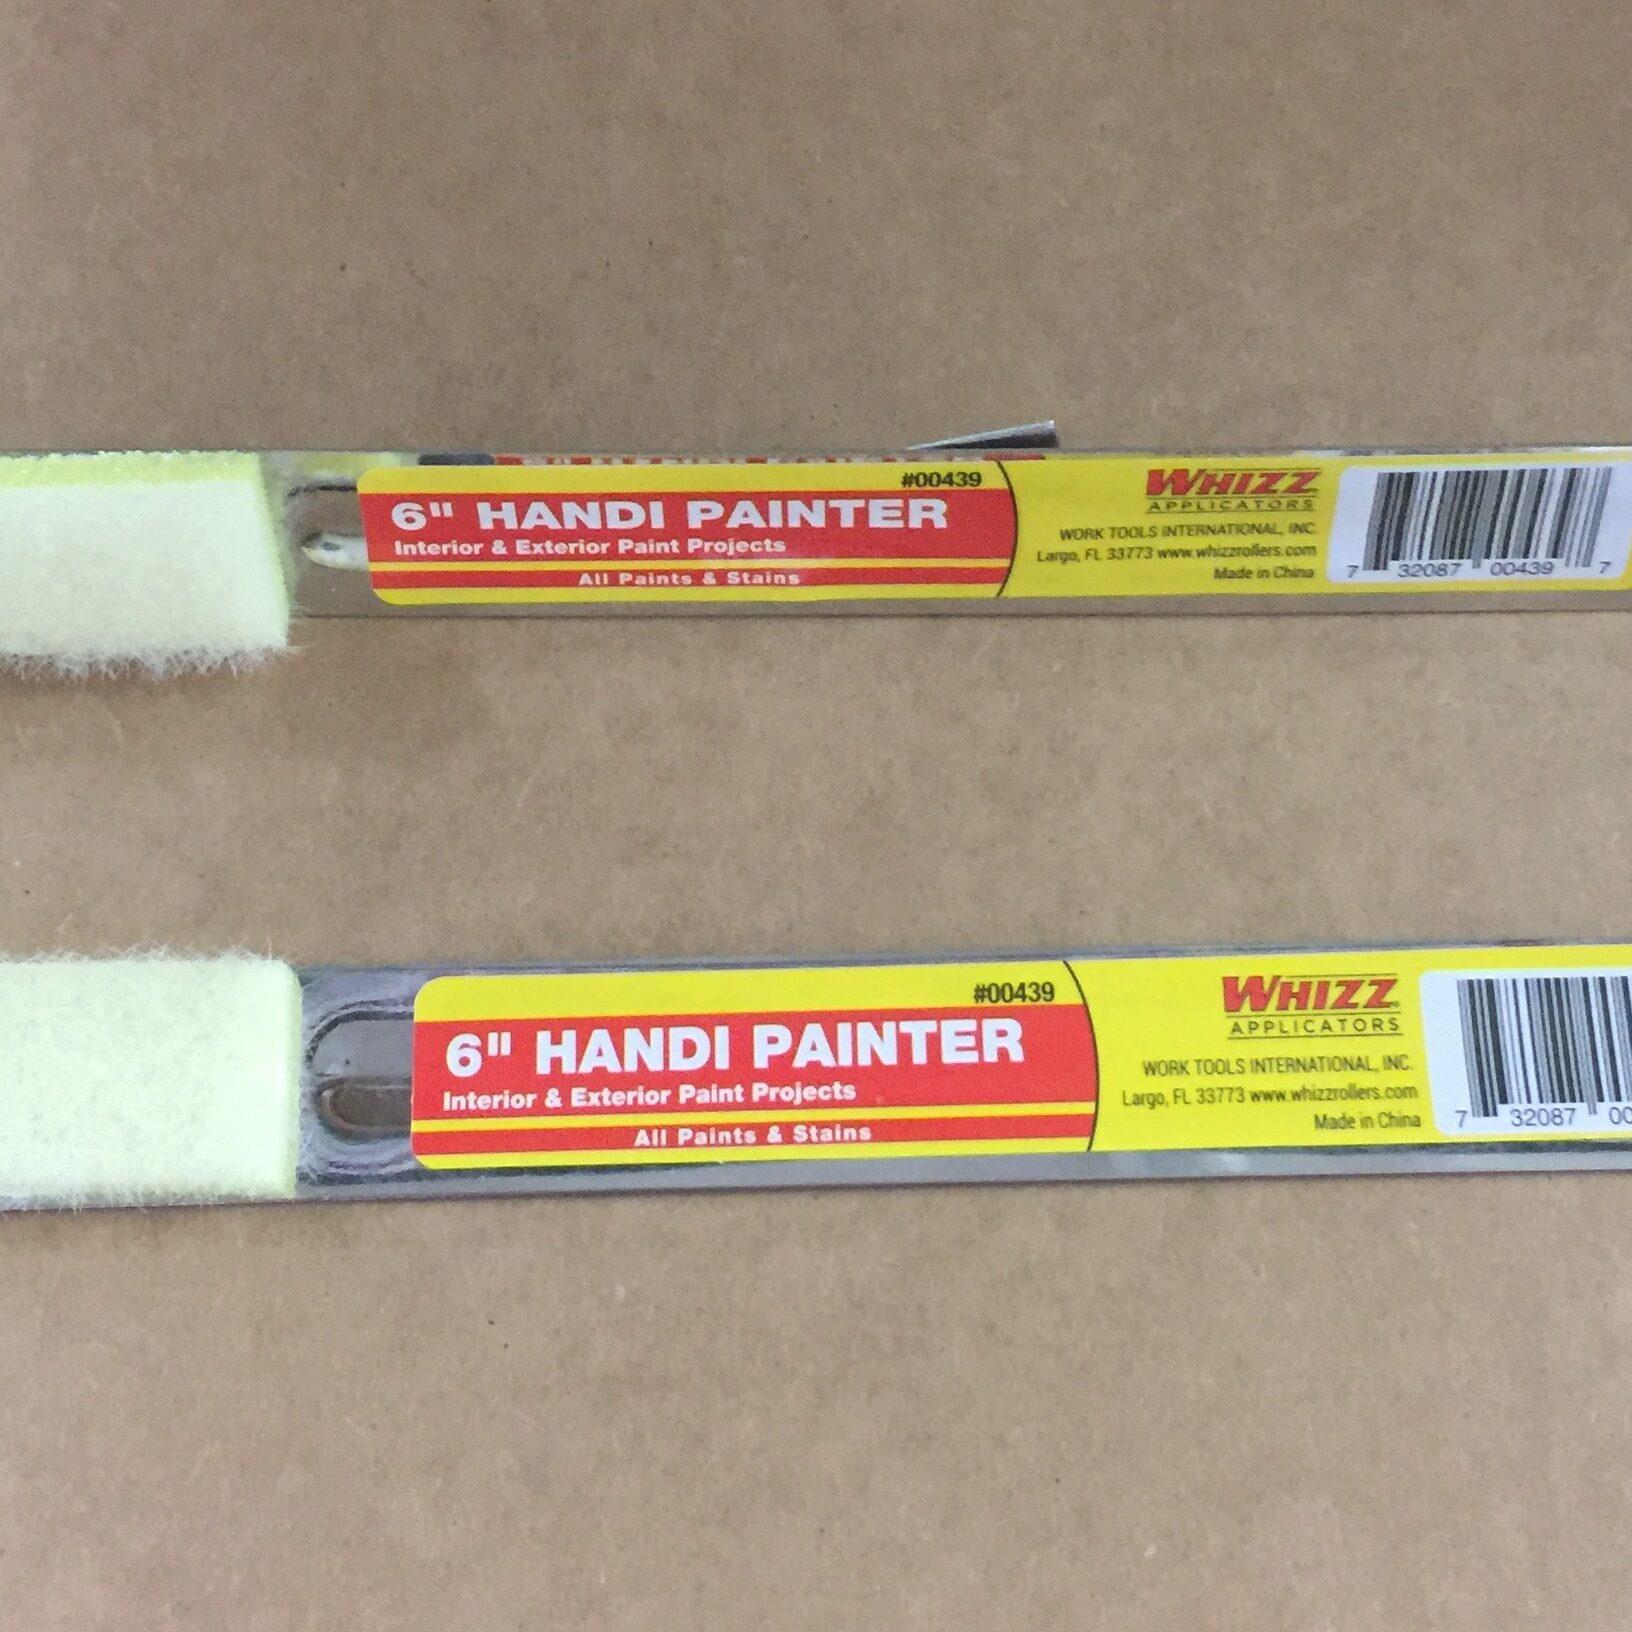 Painter's Pal tool